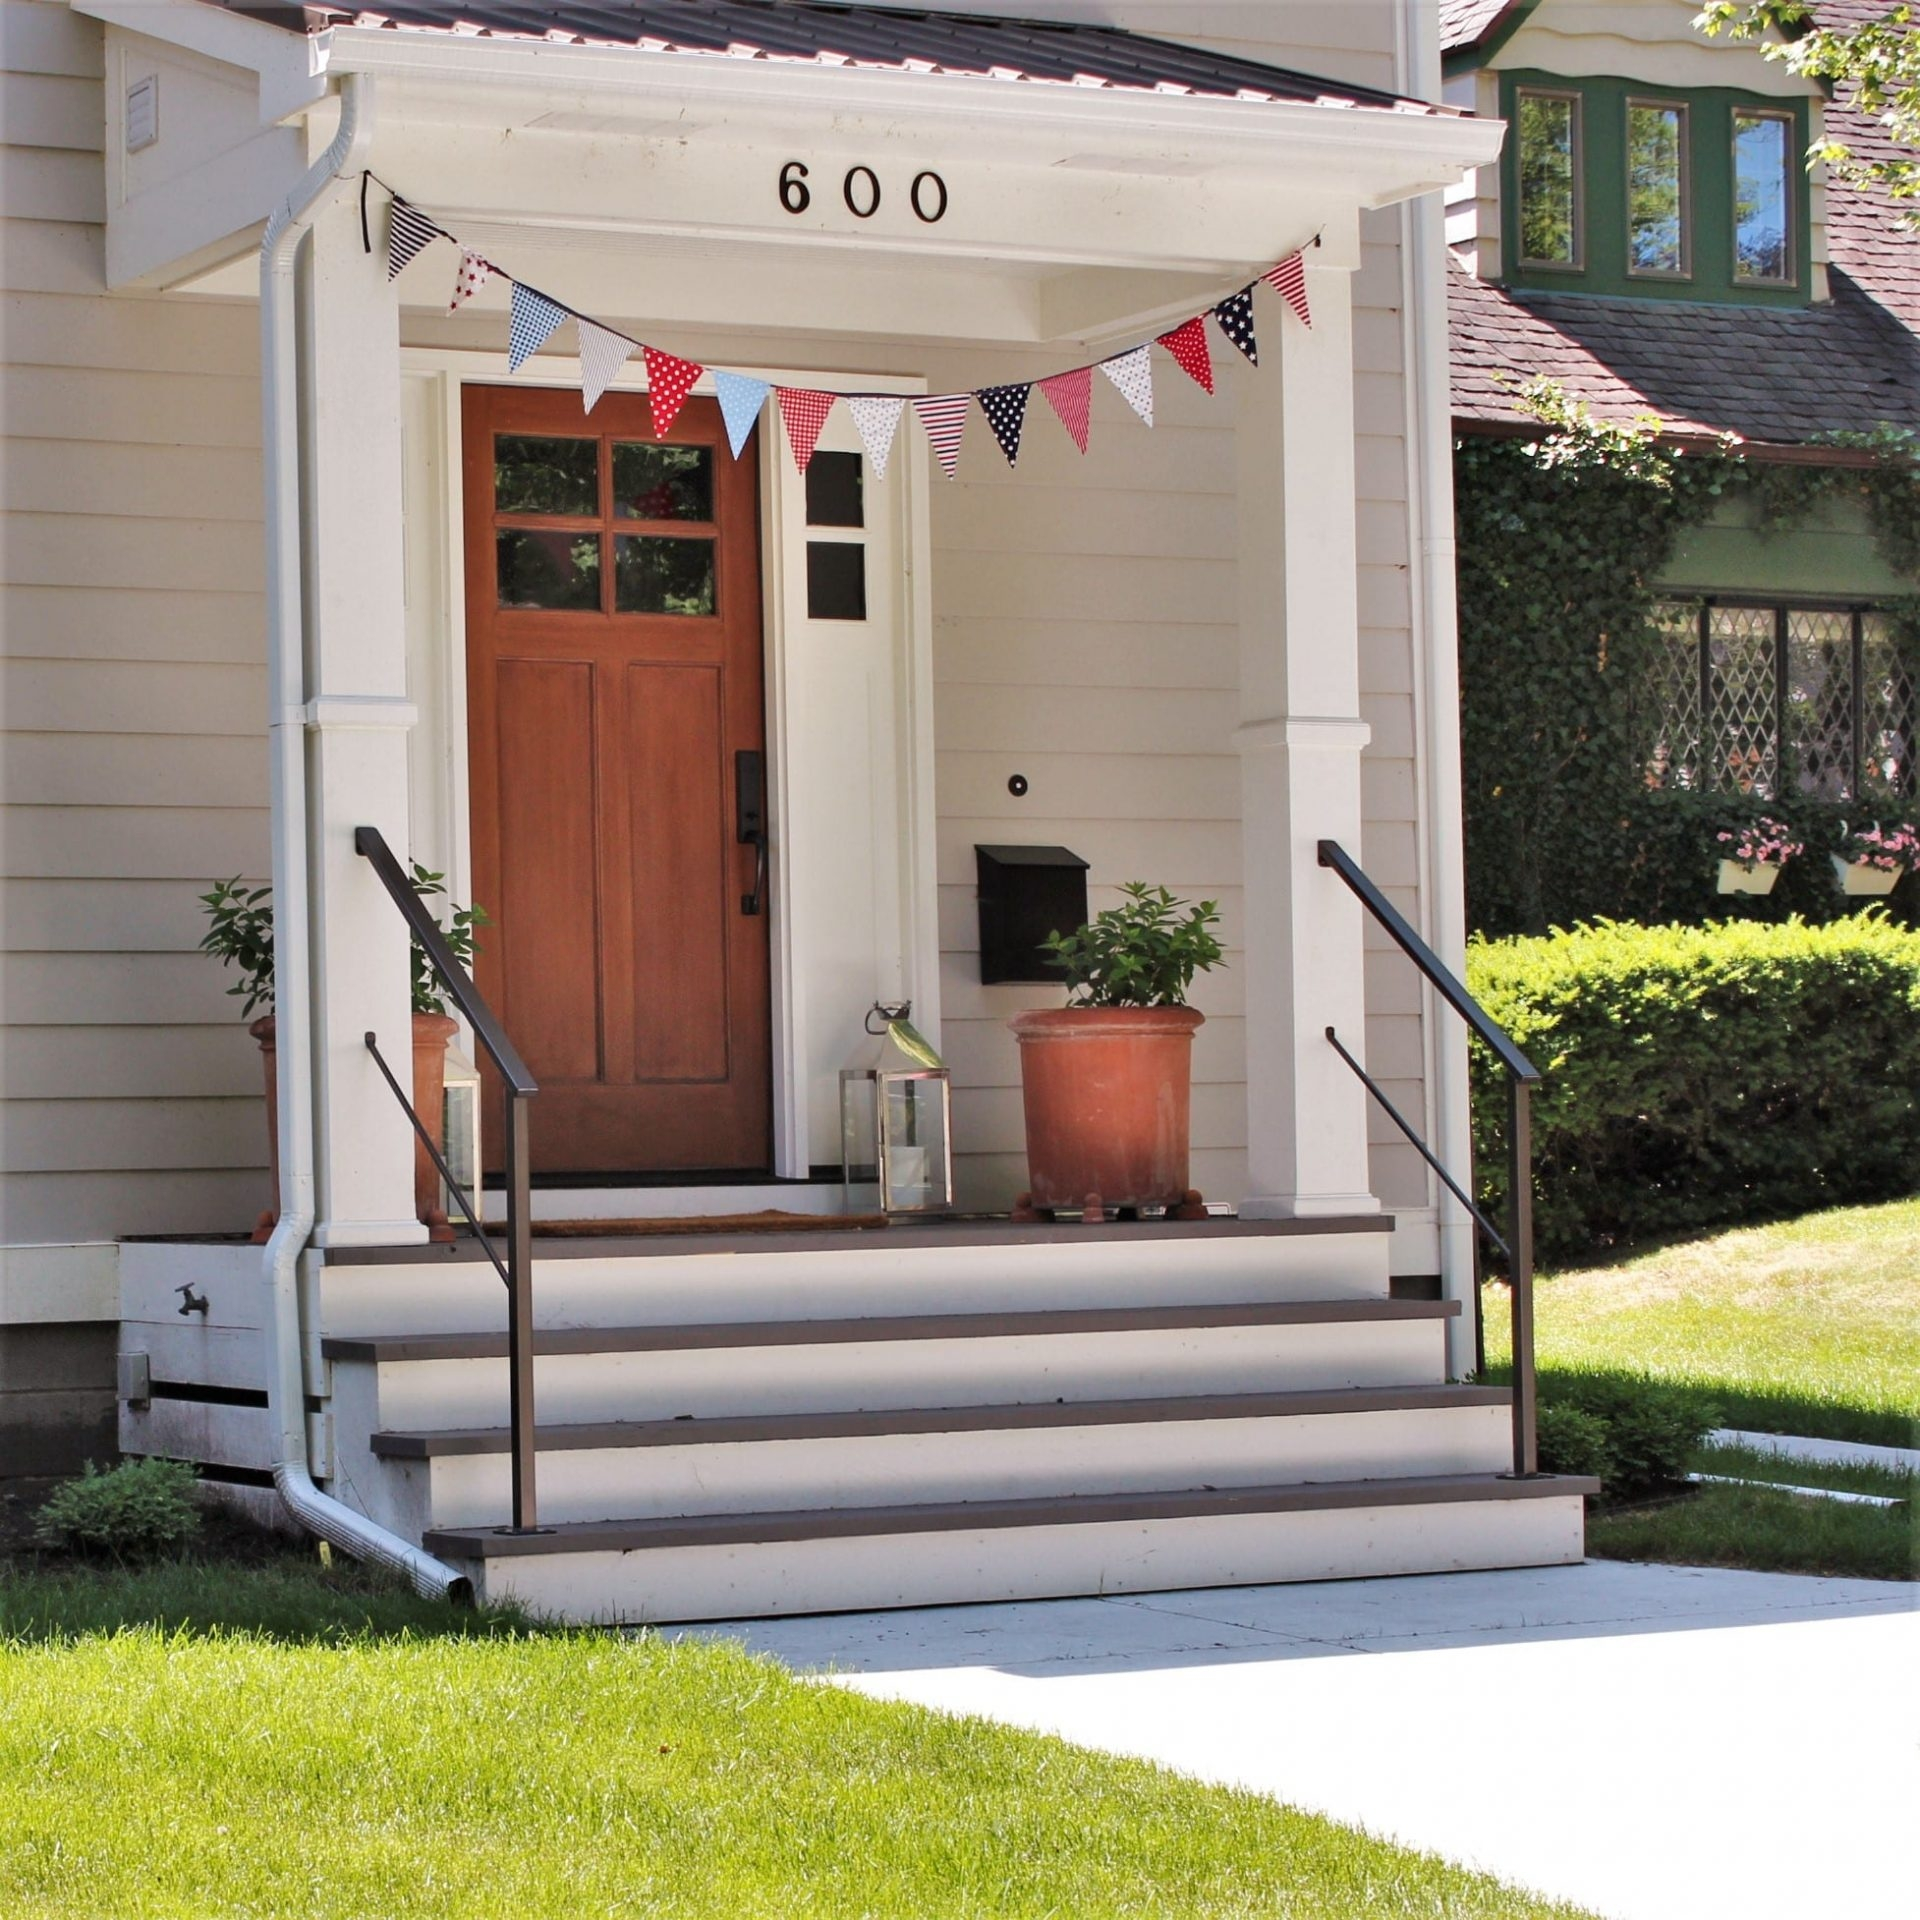 Classic Metal Handrails For Porch Steps Great Lakes Metal   Handrails For Porch Steps   Elderly   Makeover   Metal   Back Porch   Aluminum